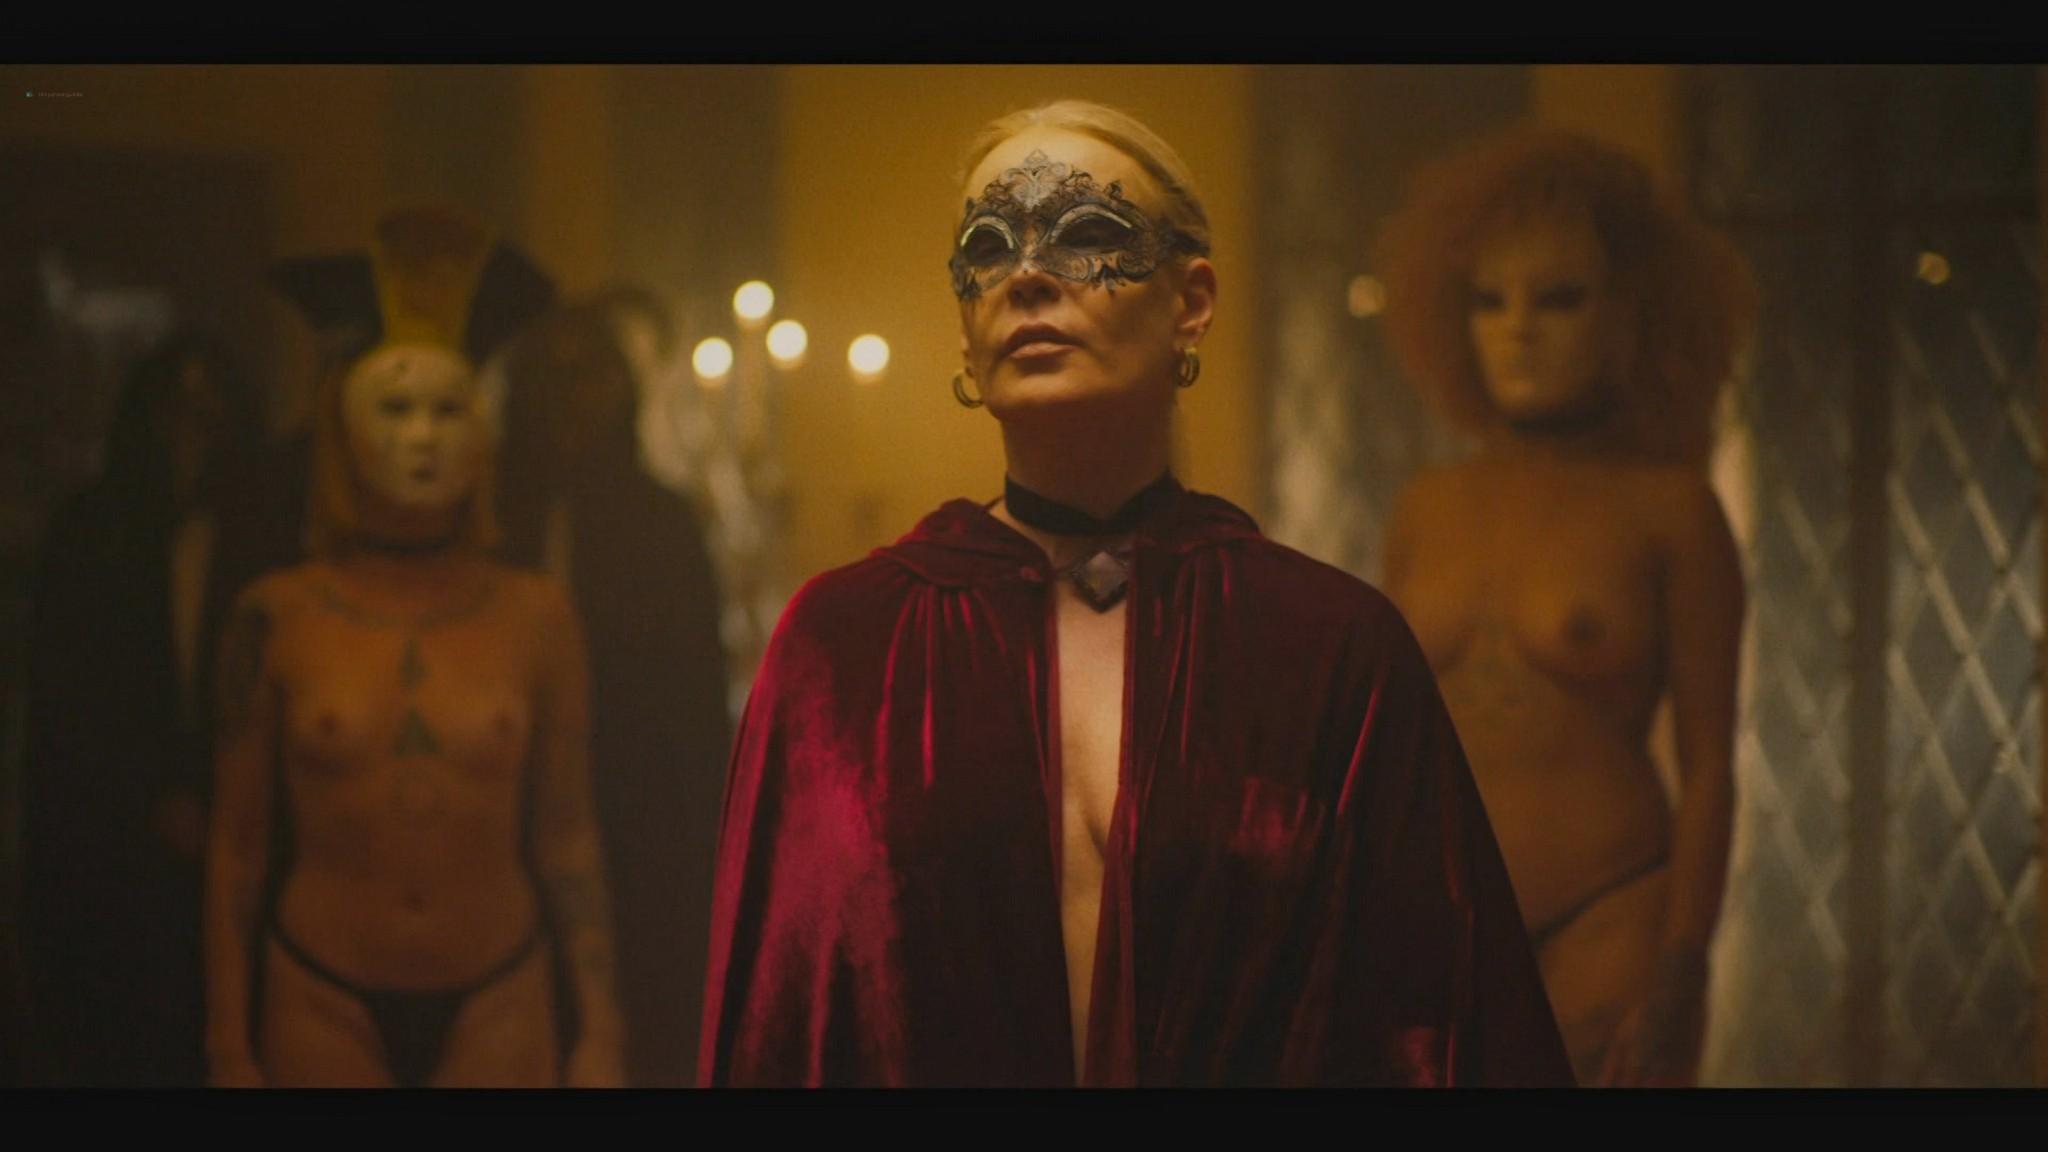 Brunna Martins nude Carolina Ferraz Natalia Lage and others nude orgy and sexy Hard 2021 s3e1 2 1080p Web 10